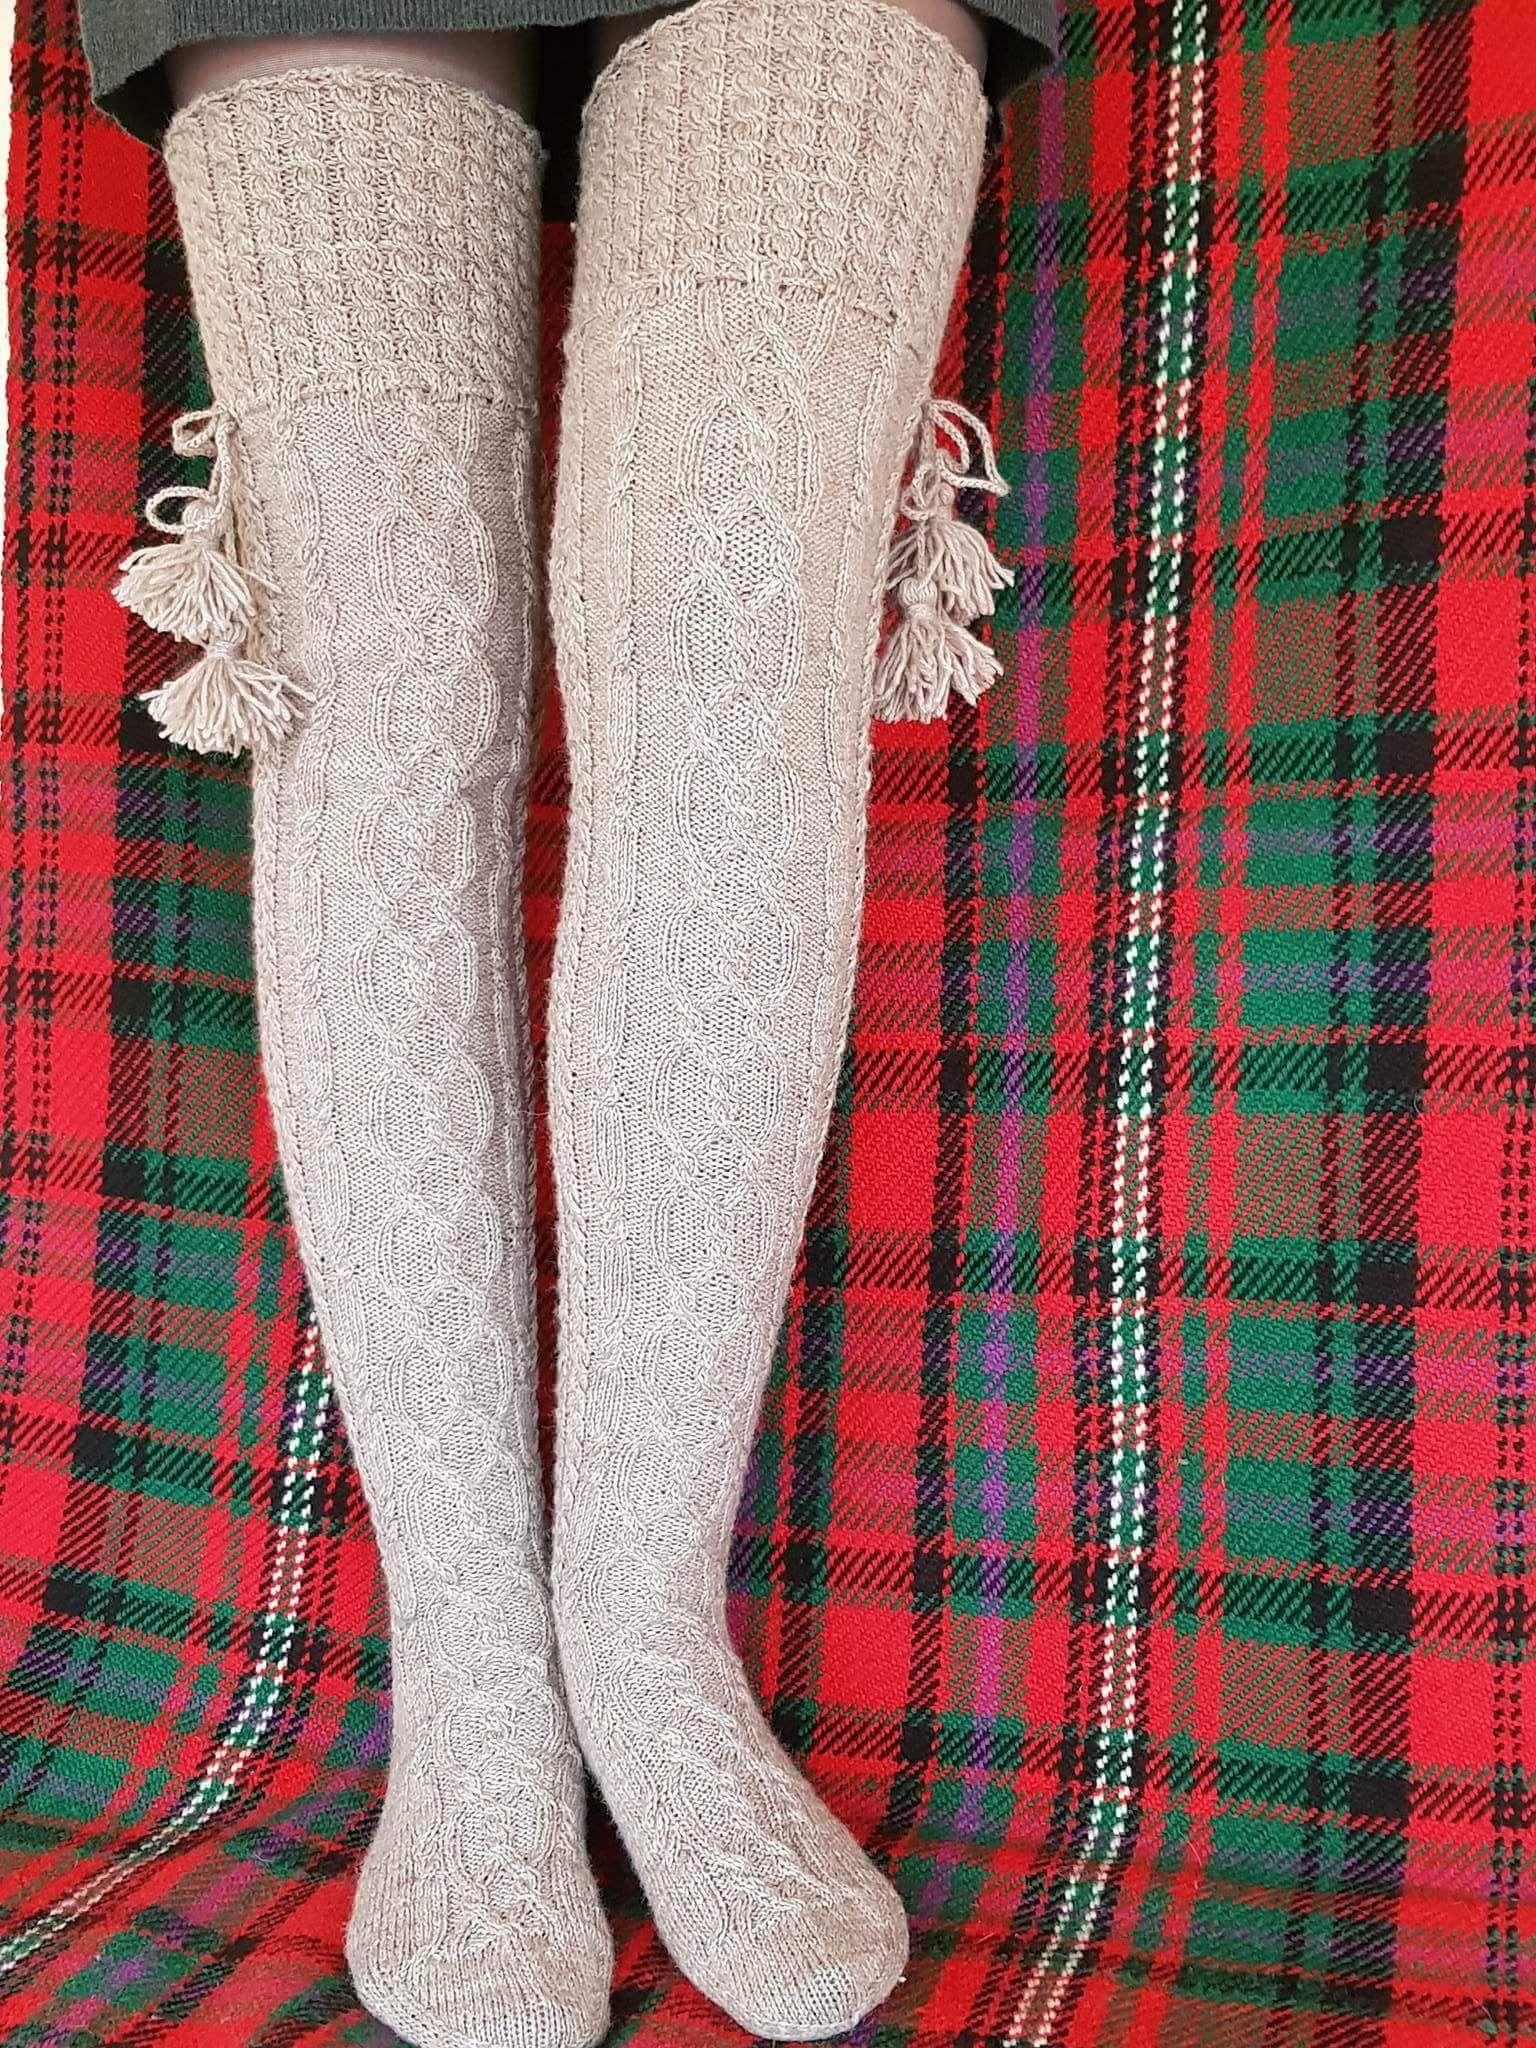 52a19a96026 Knit socks Wool socks Overknee socks Knit high knee socks Beige socks Thigh  high socks High socks size 39 EU